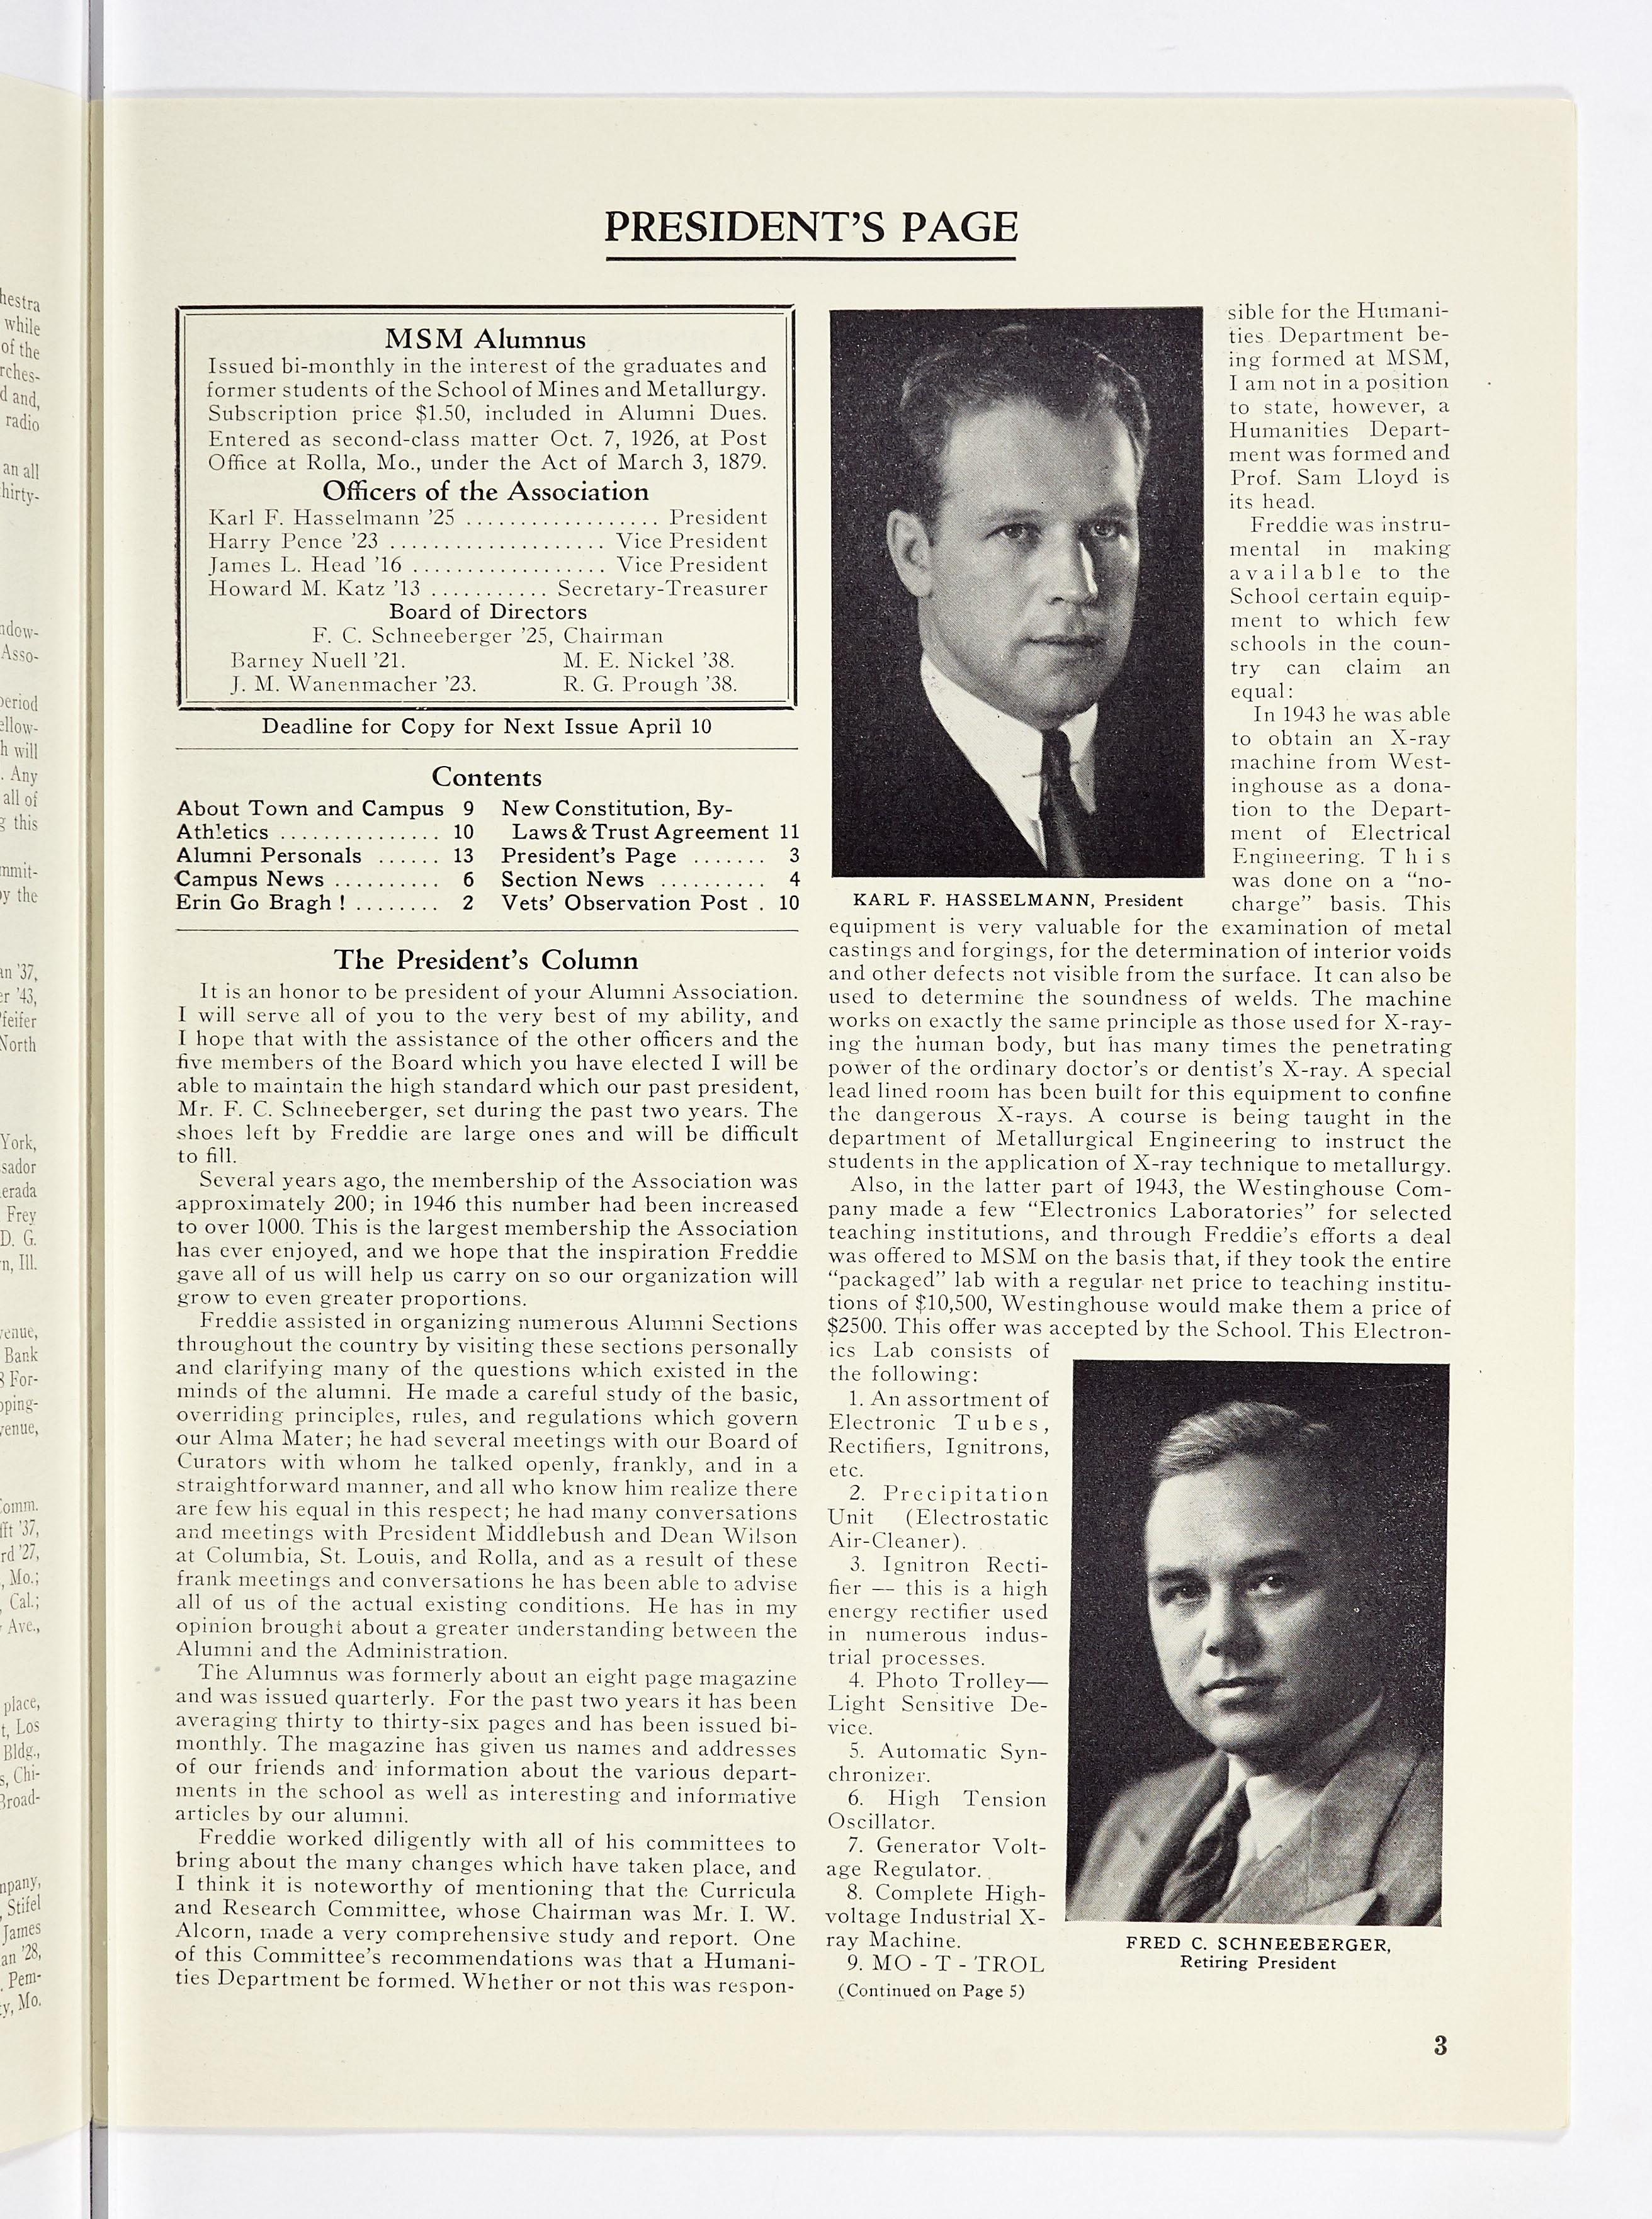 Page 3 of I g nitron R ecti